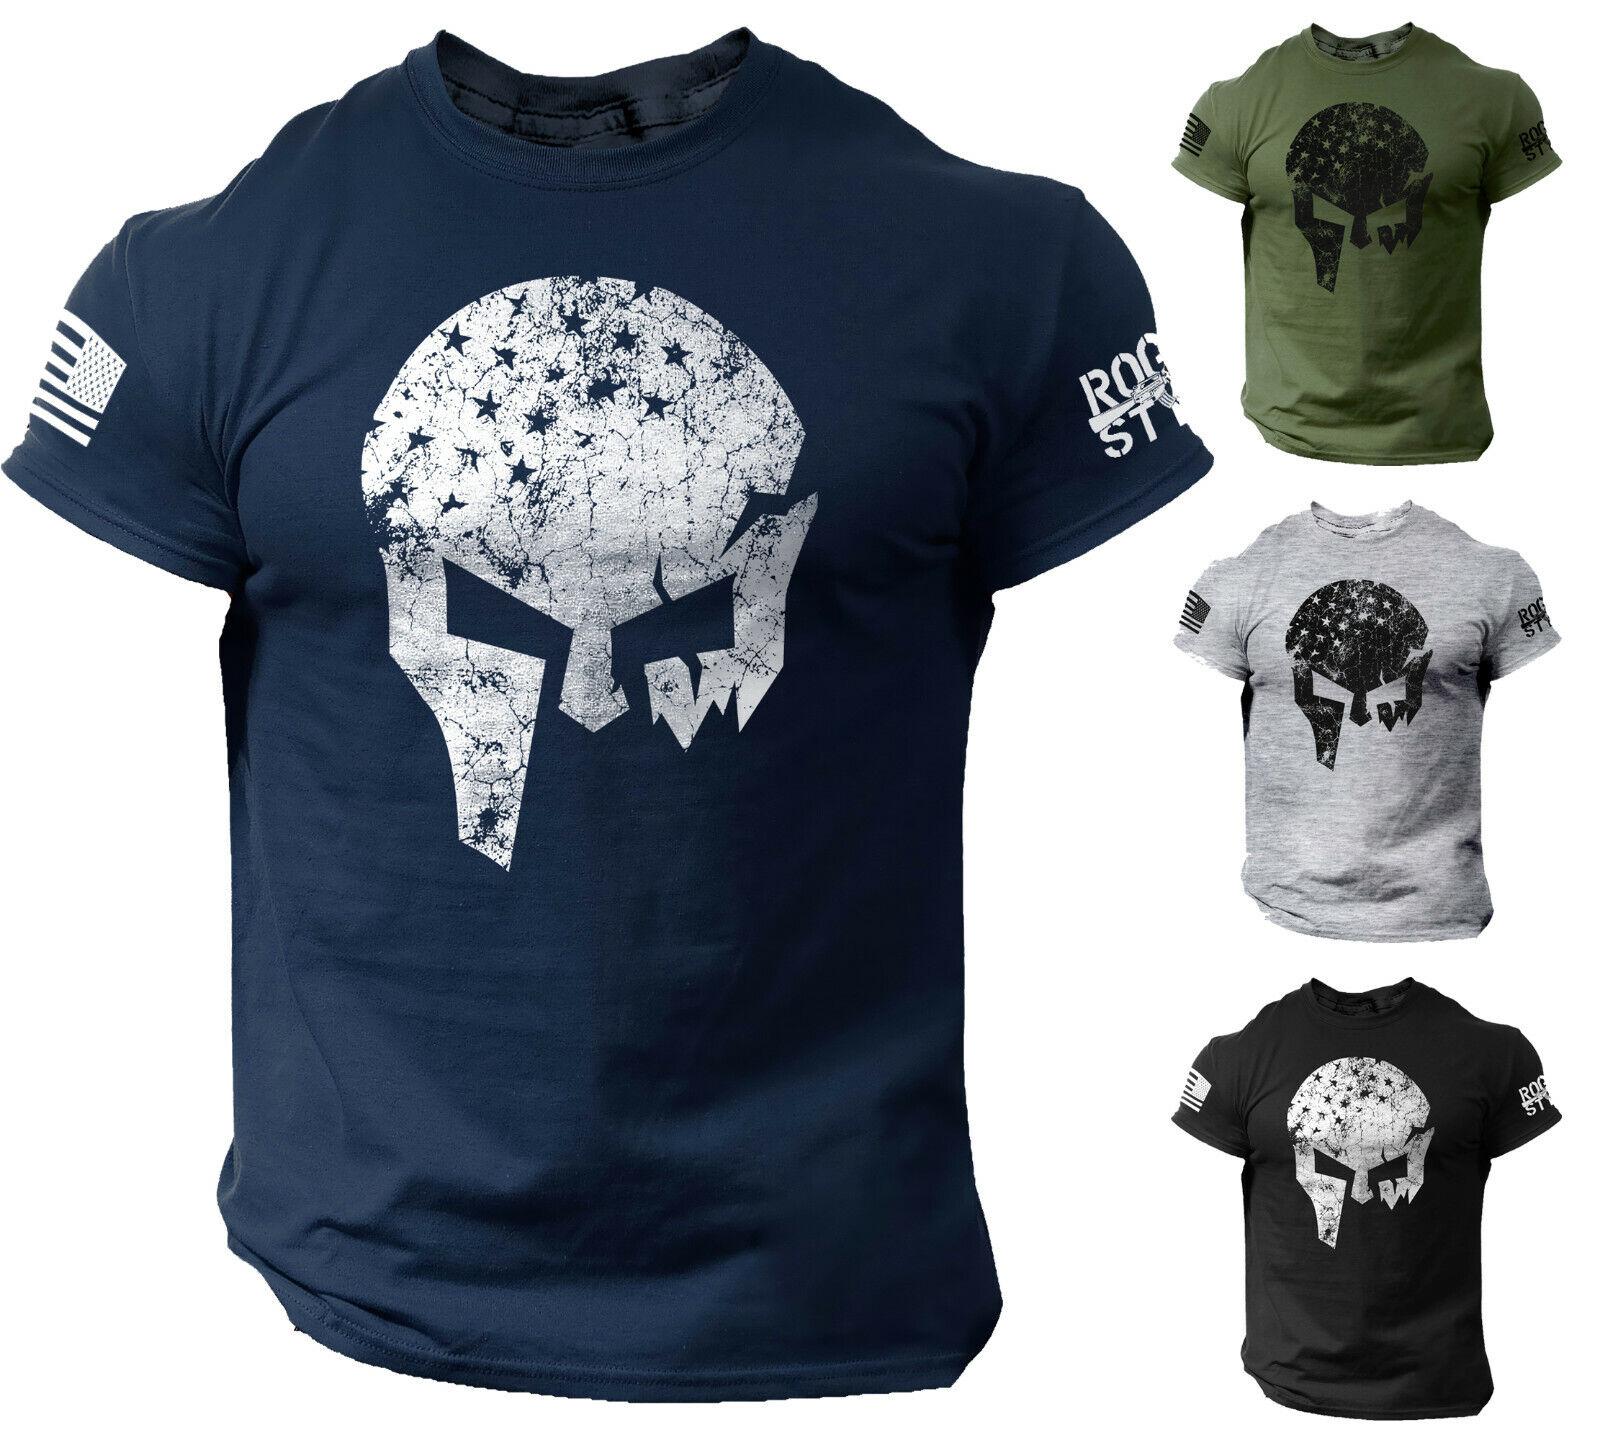 Skull Warrior Men's T Shirt Vikings American Flag Style US Veteran Tee Clothing, Shoes & Accessories